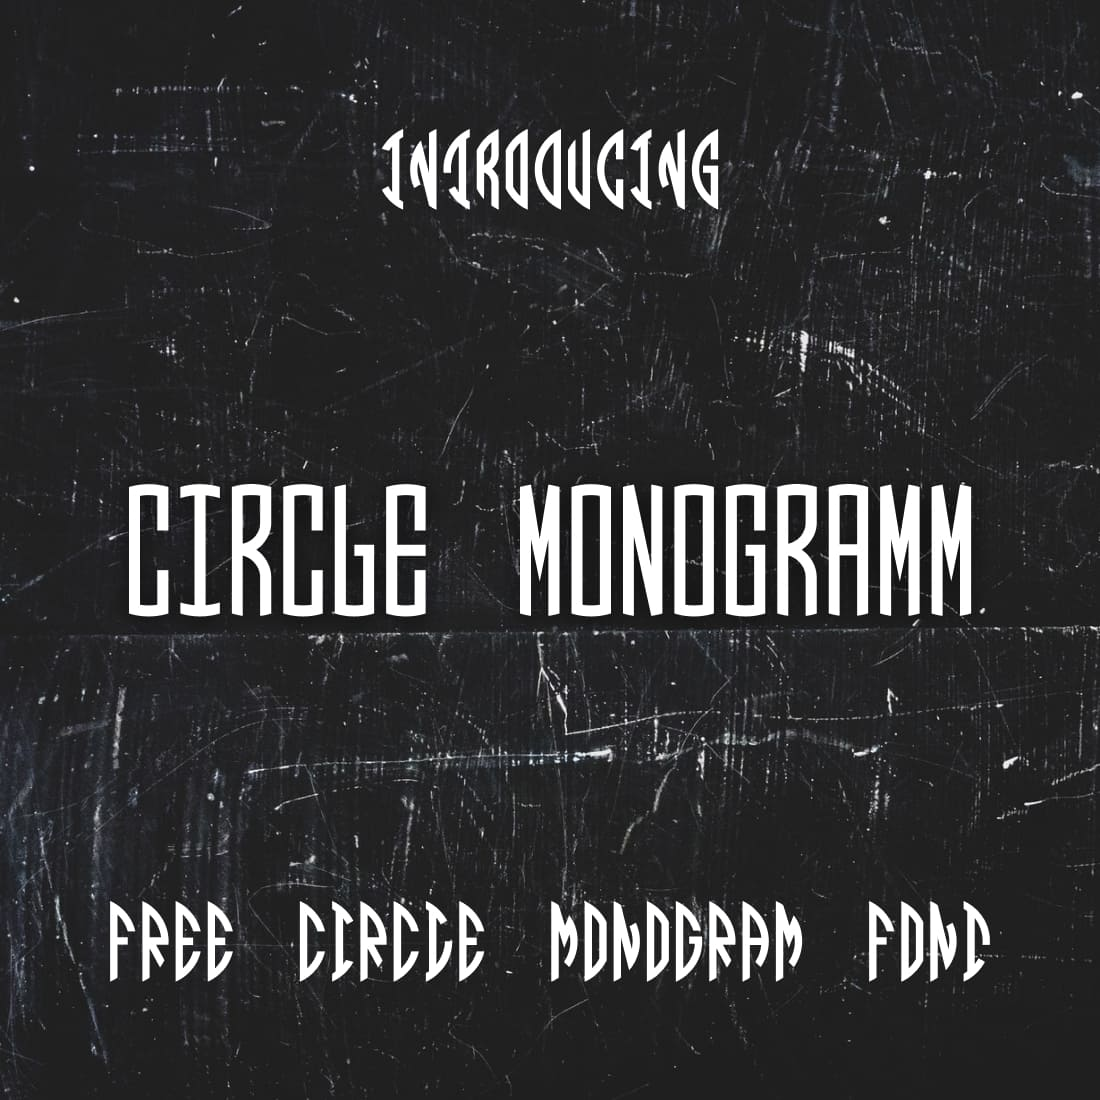 Main cover image for Free circle monogram font by MasterBundles.